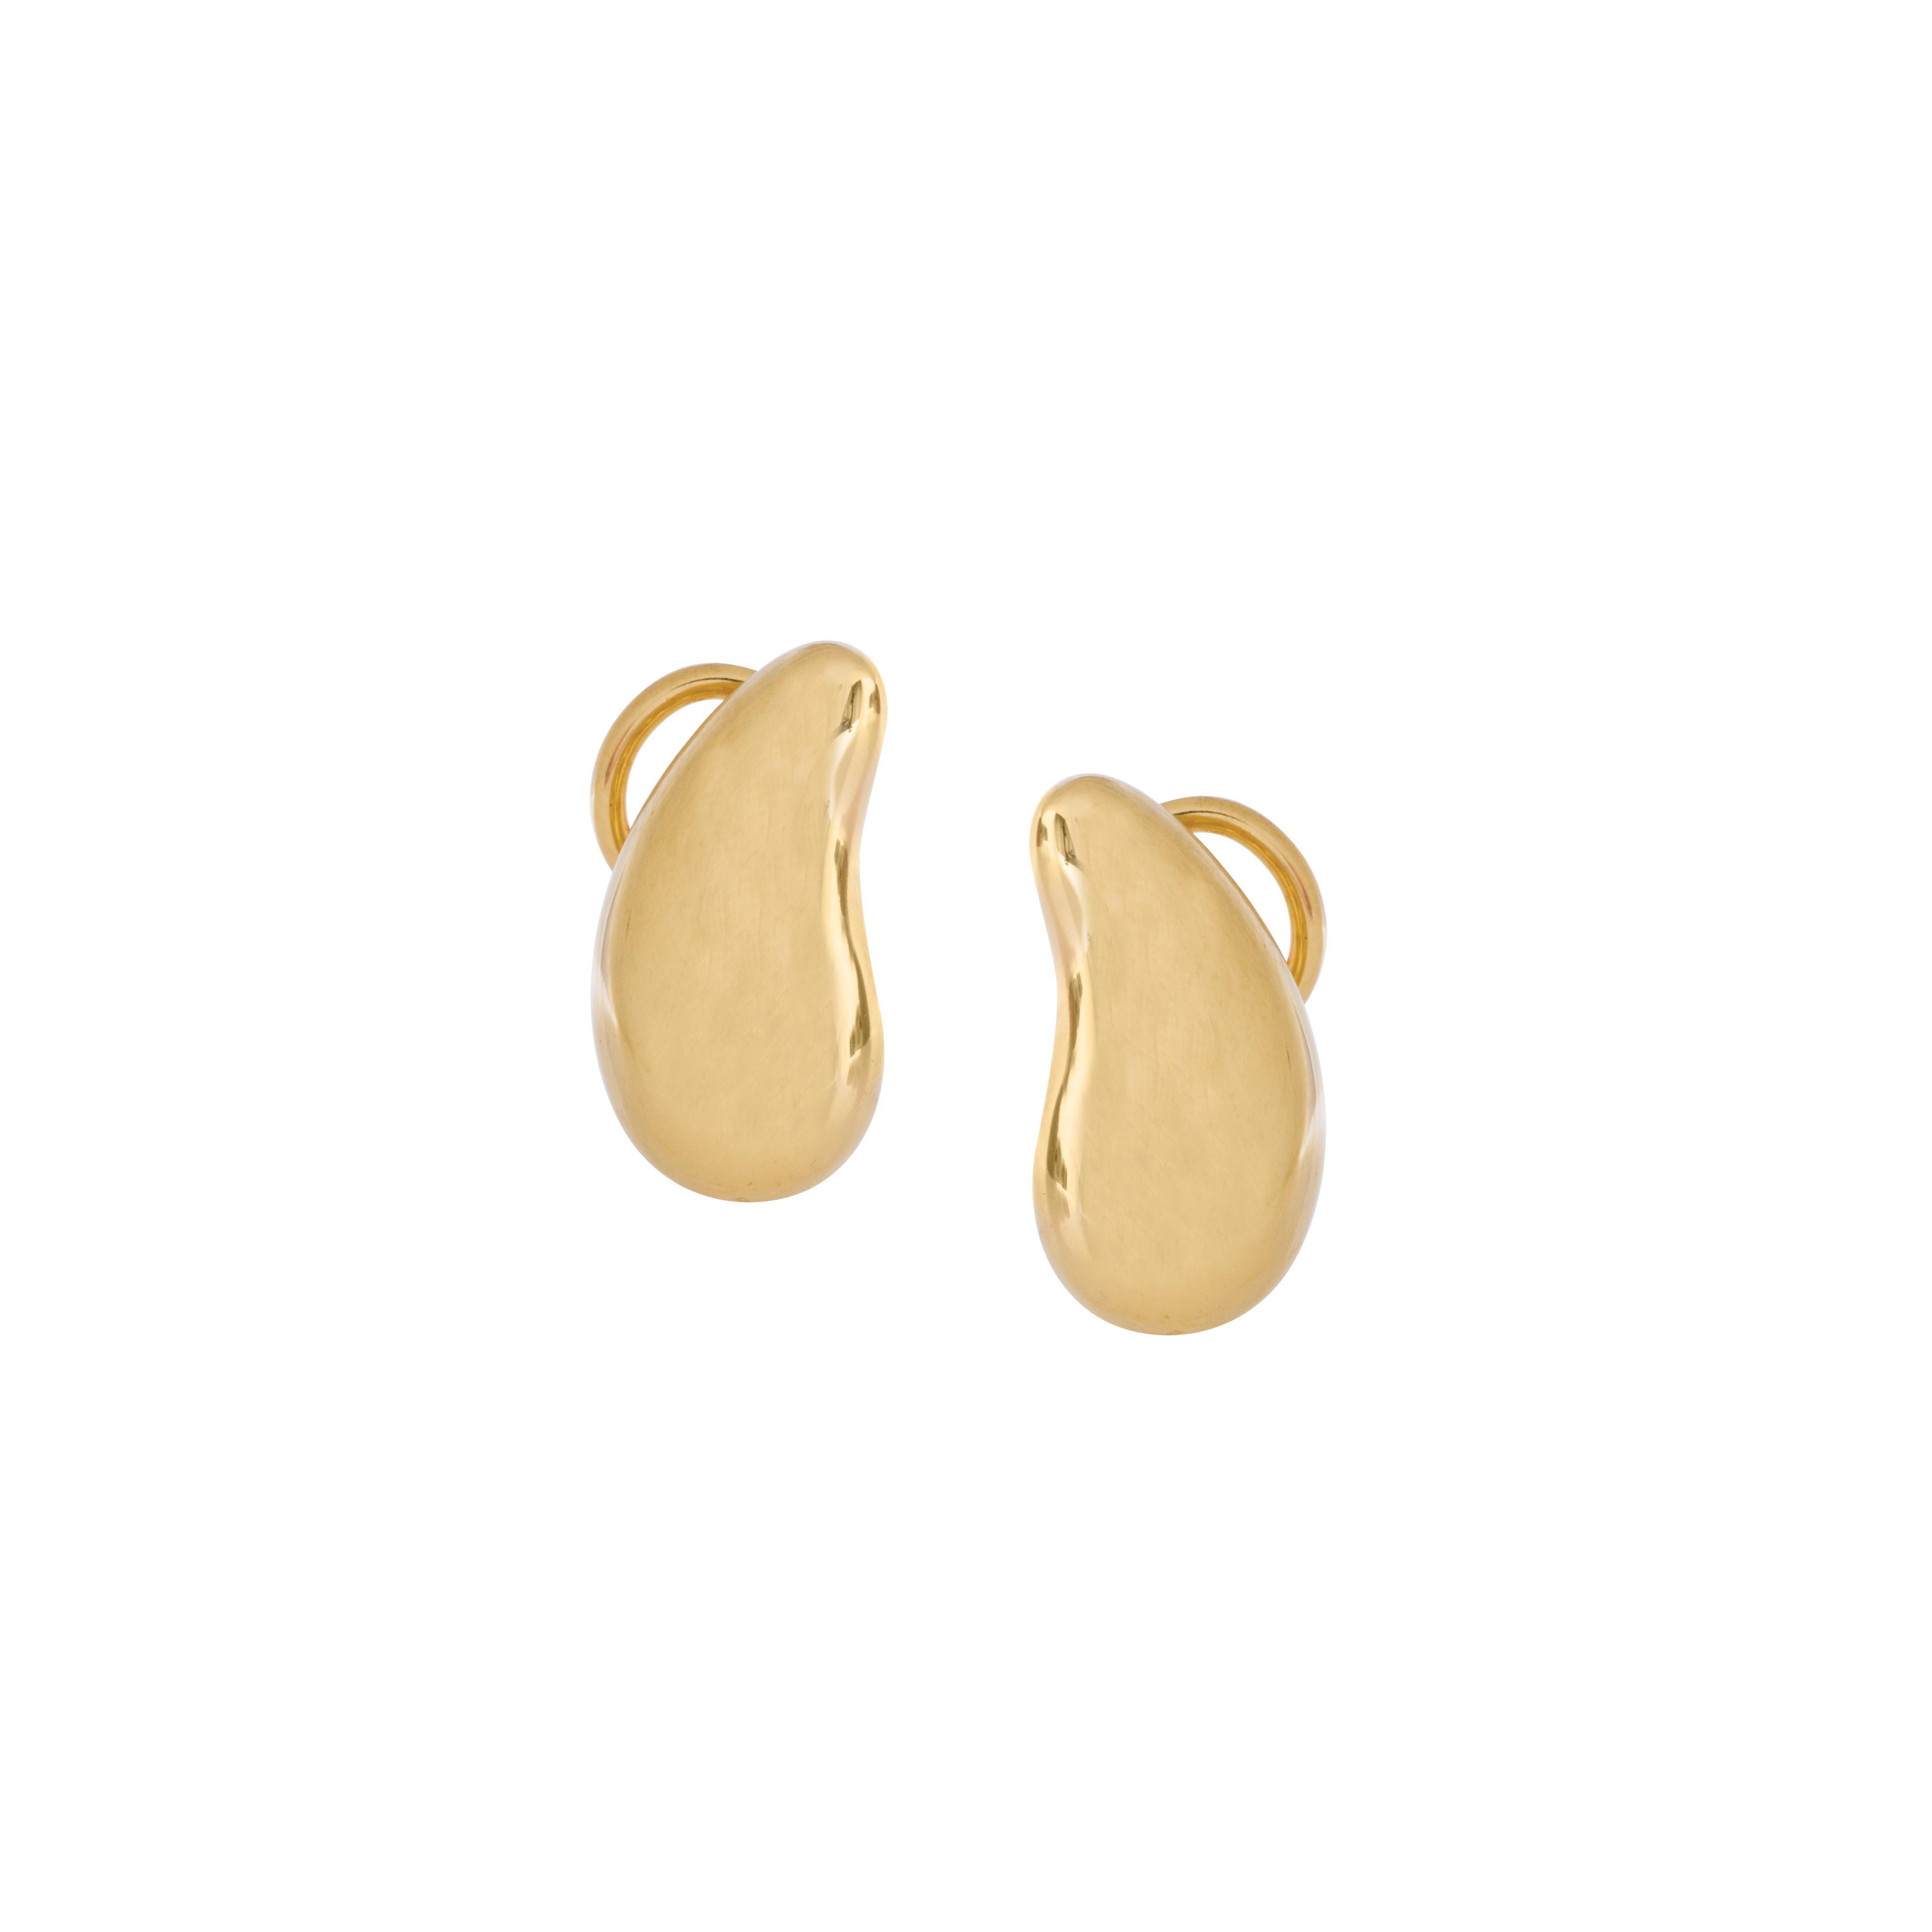 Vintage Tiffany & Co. Elsa Peretti Teardrop Stud Earrings